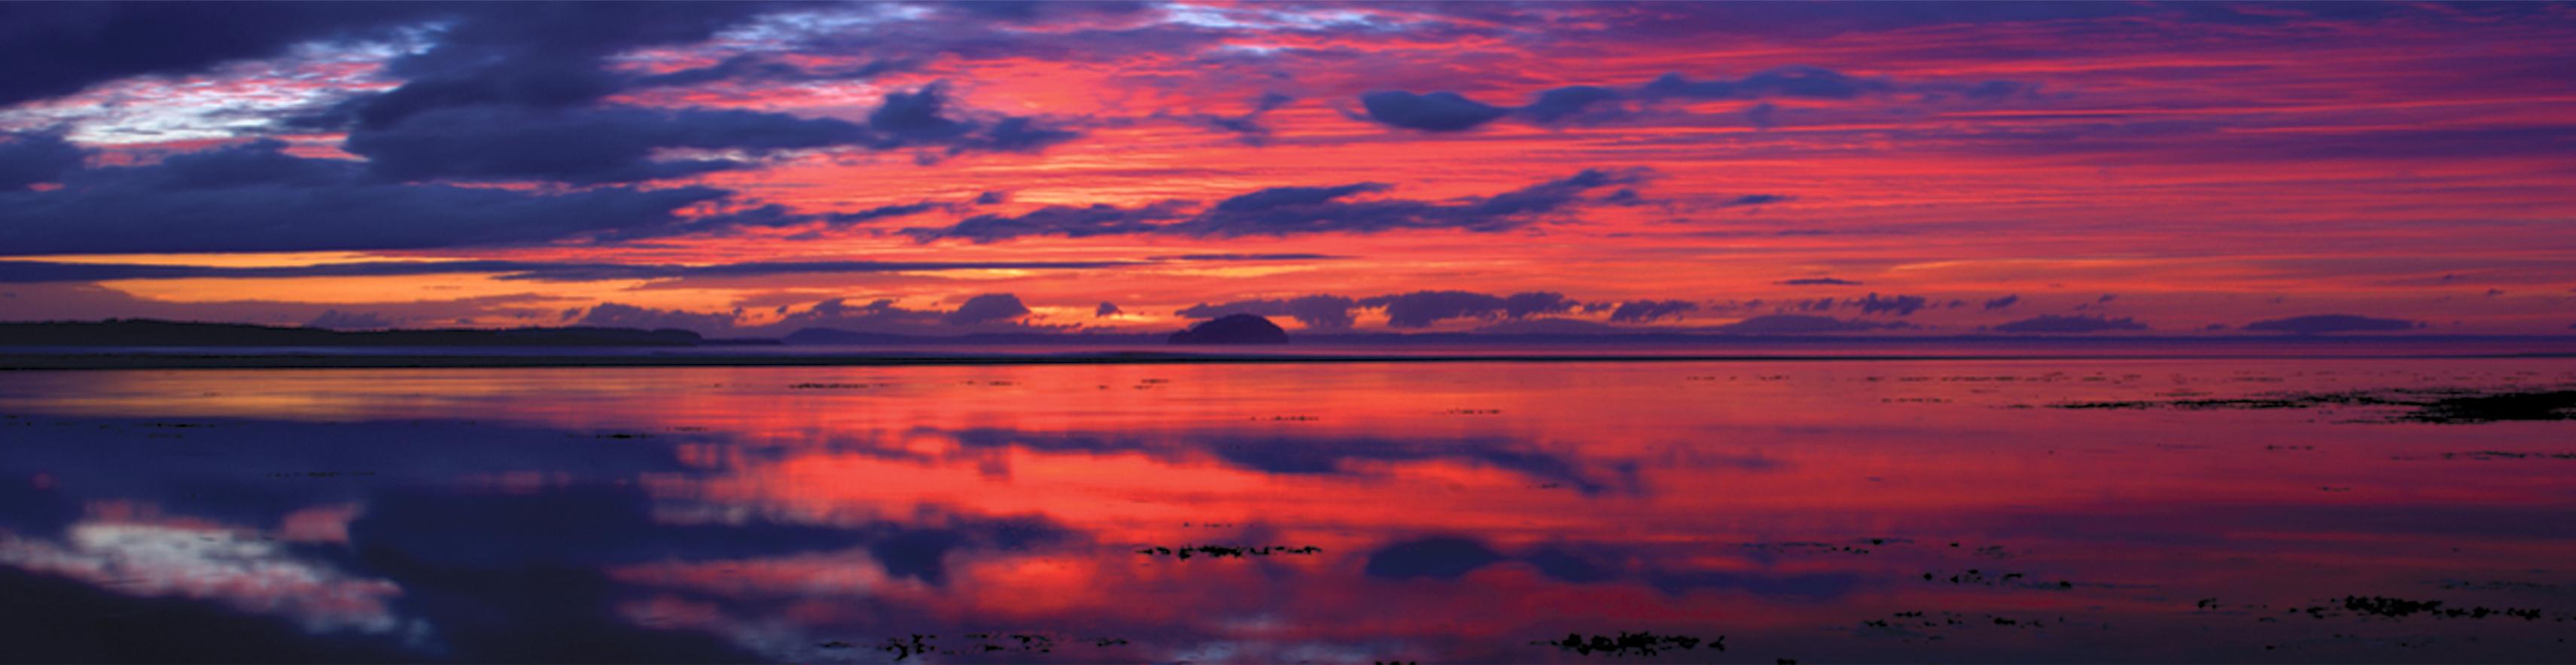 Belhaven Sunset